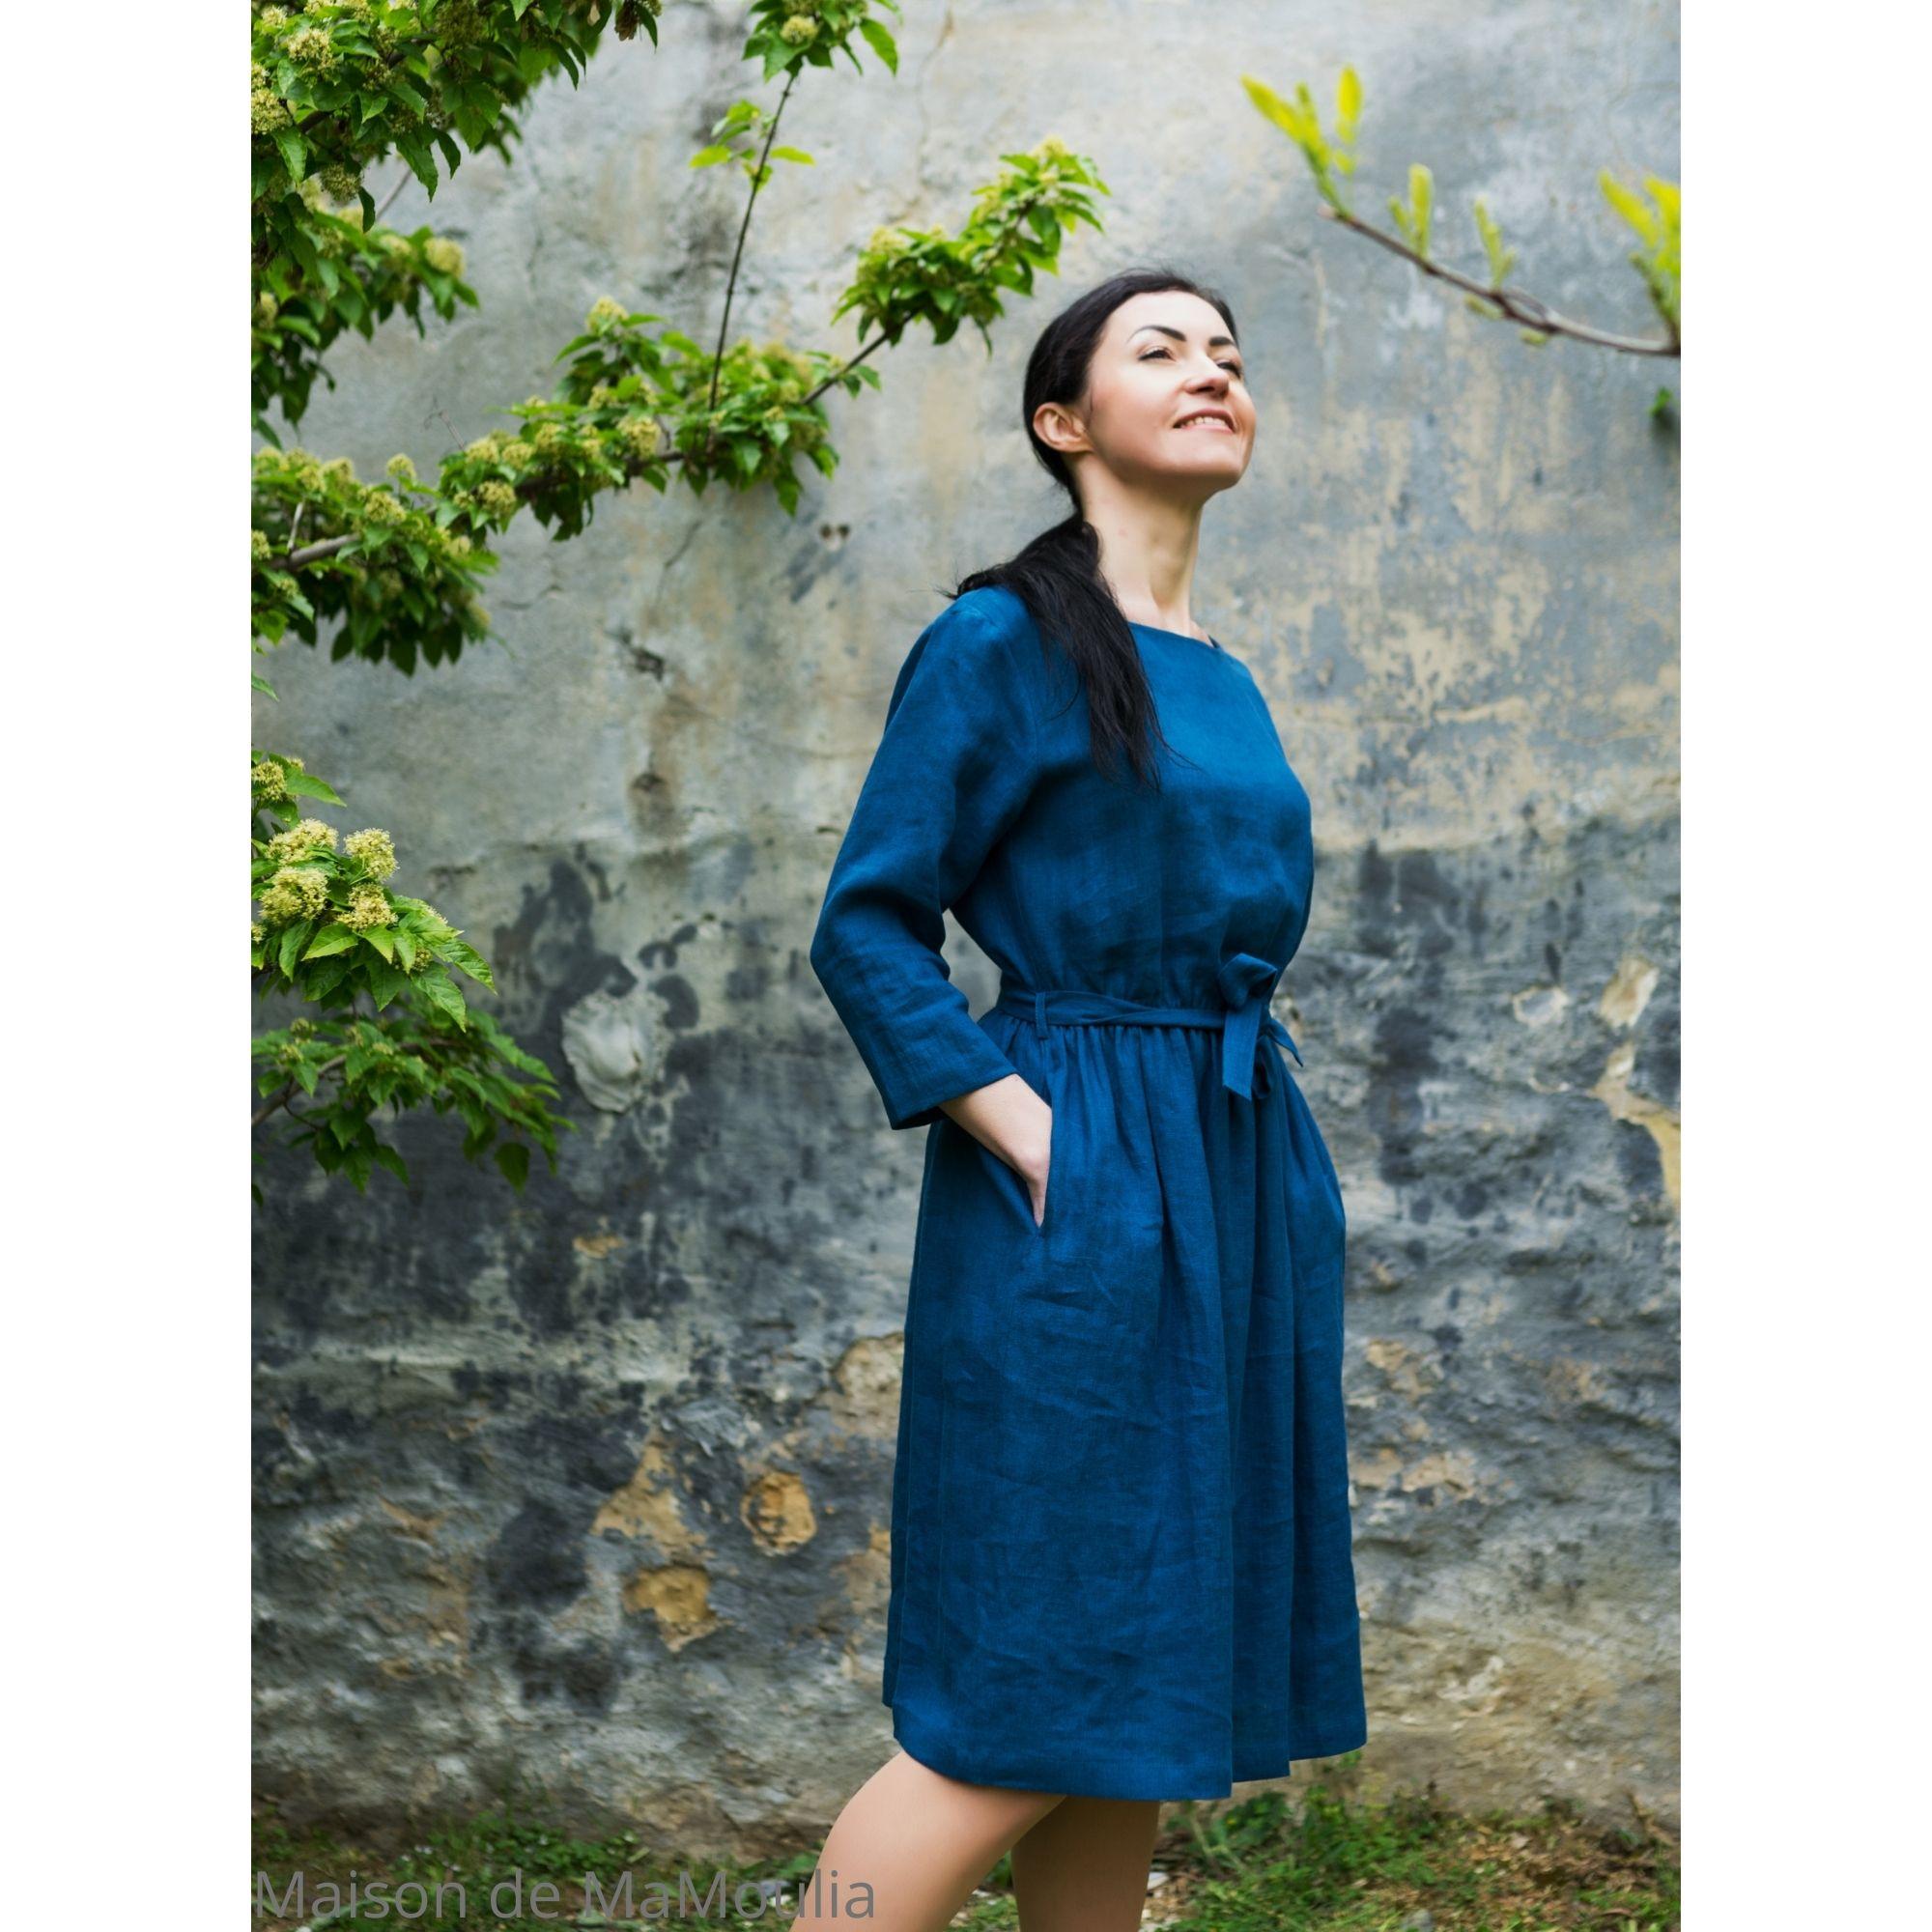 OFFON - Robe midi avec ceinture - 100% lin lavé - bleu canard